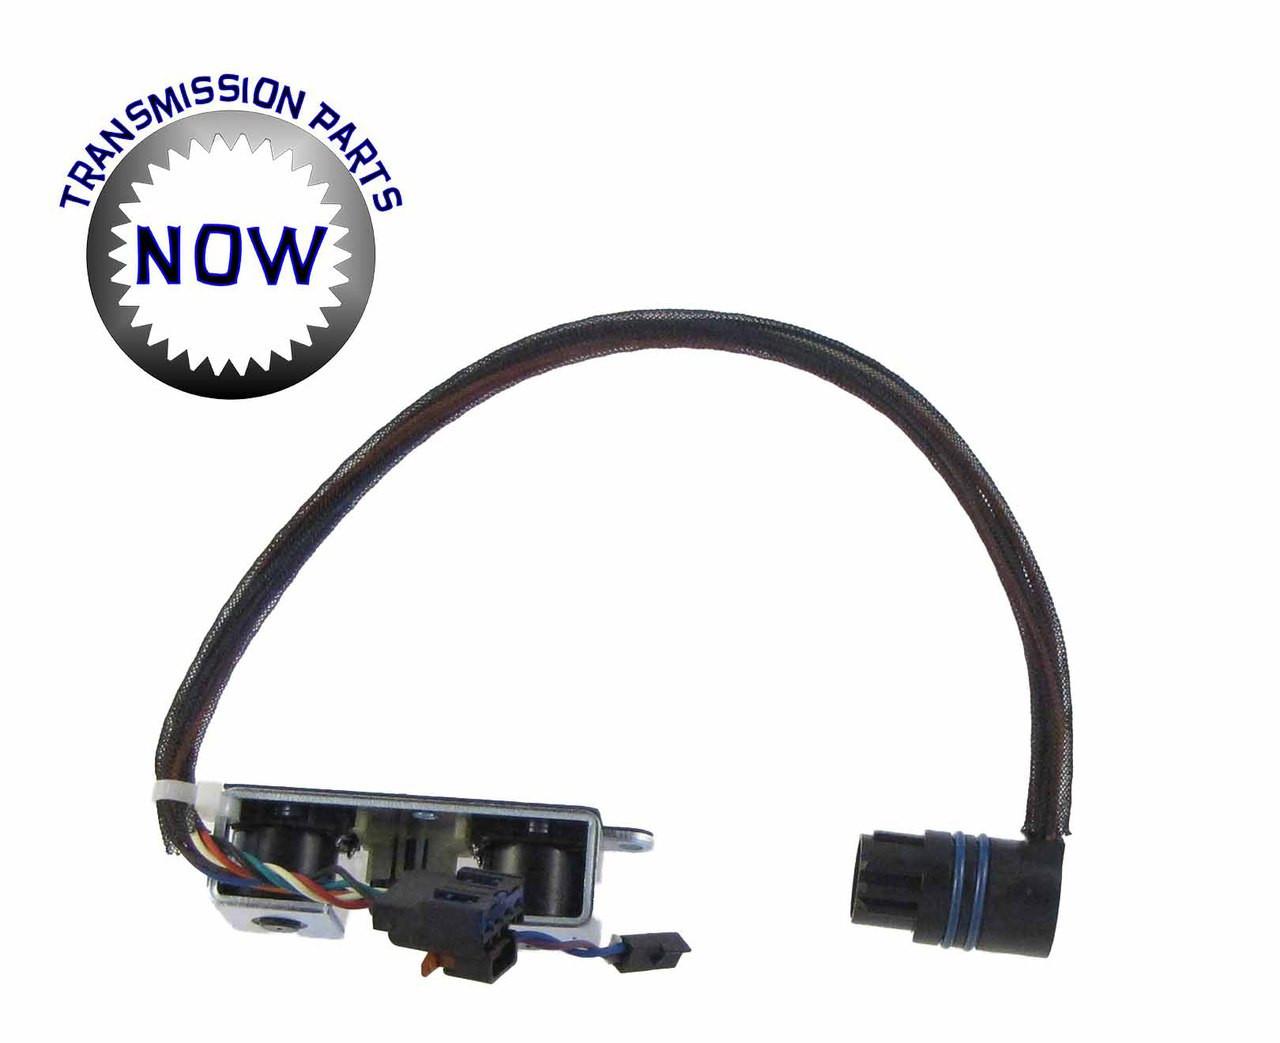 4r75w transmission valve body diagram c5 transmission 4l60e accumulator installation 4l60e transmission wiring connector diagram [ 1280 x 1043 Pixel ]